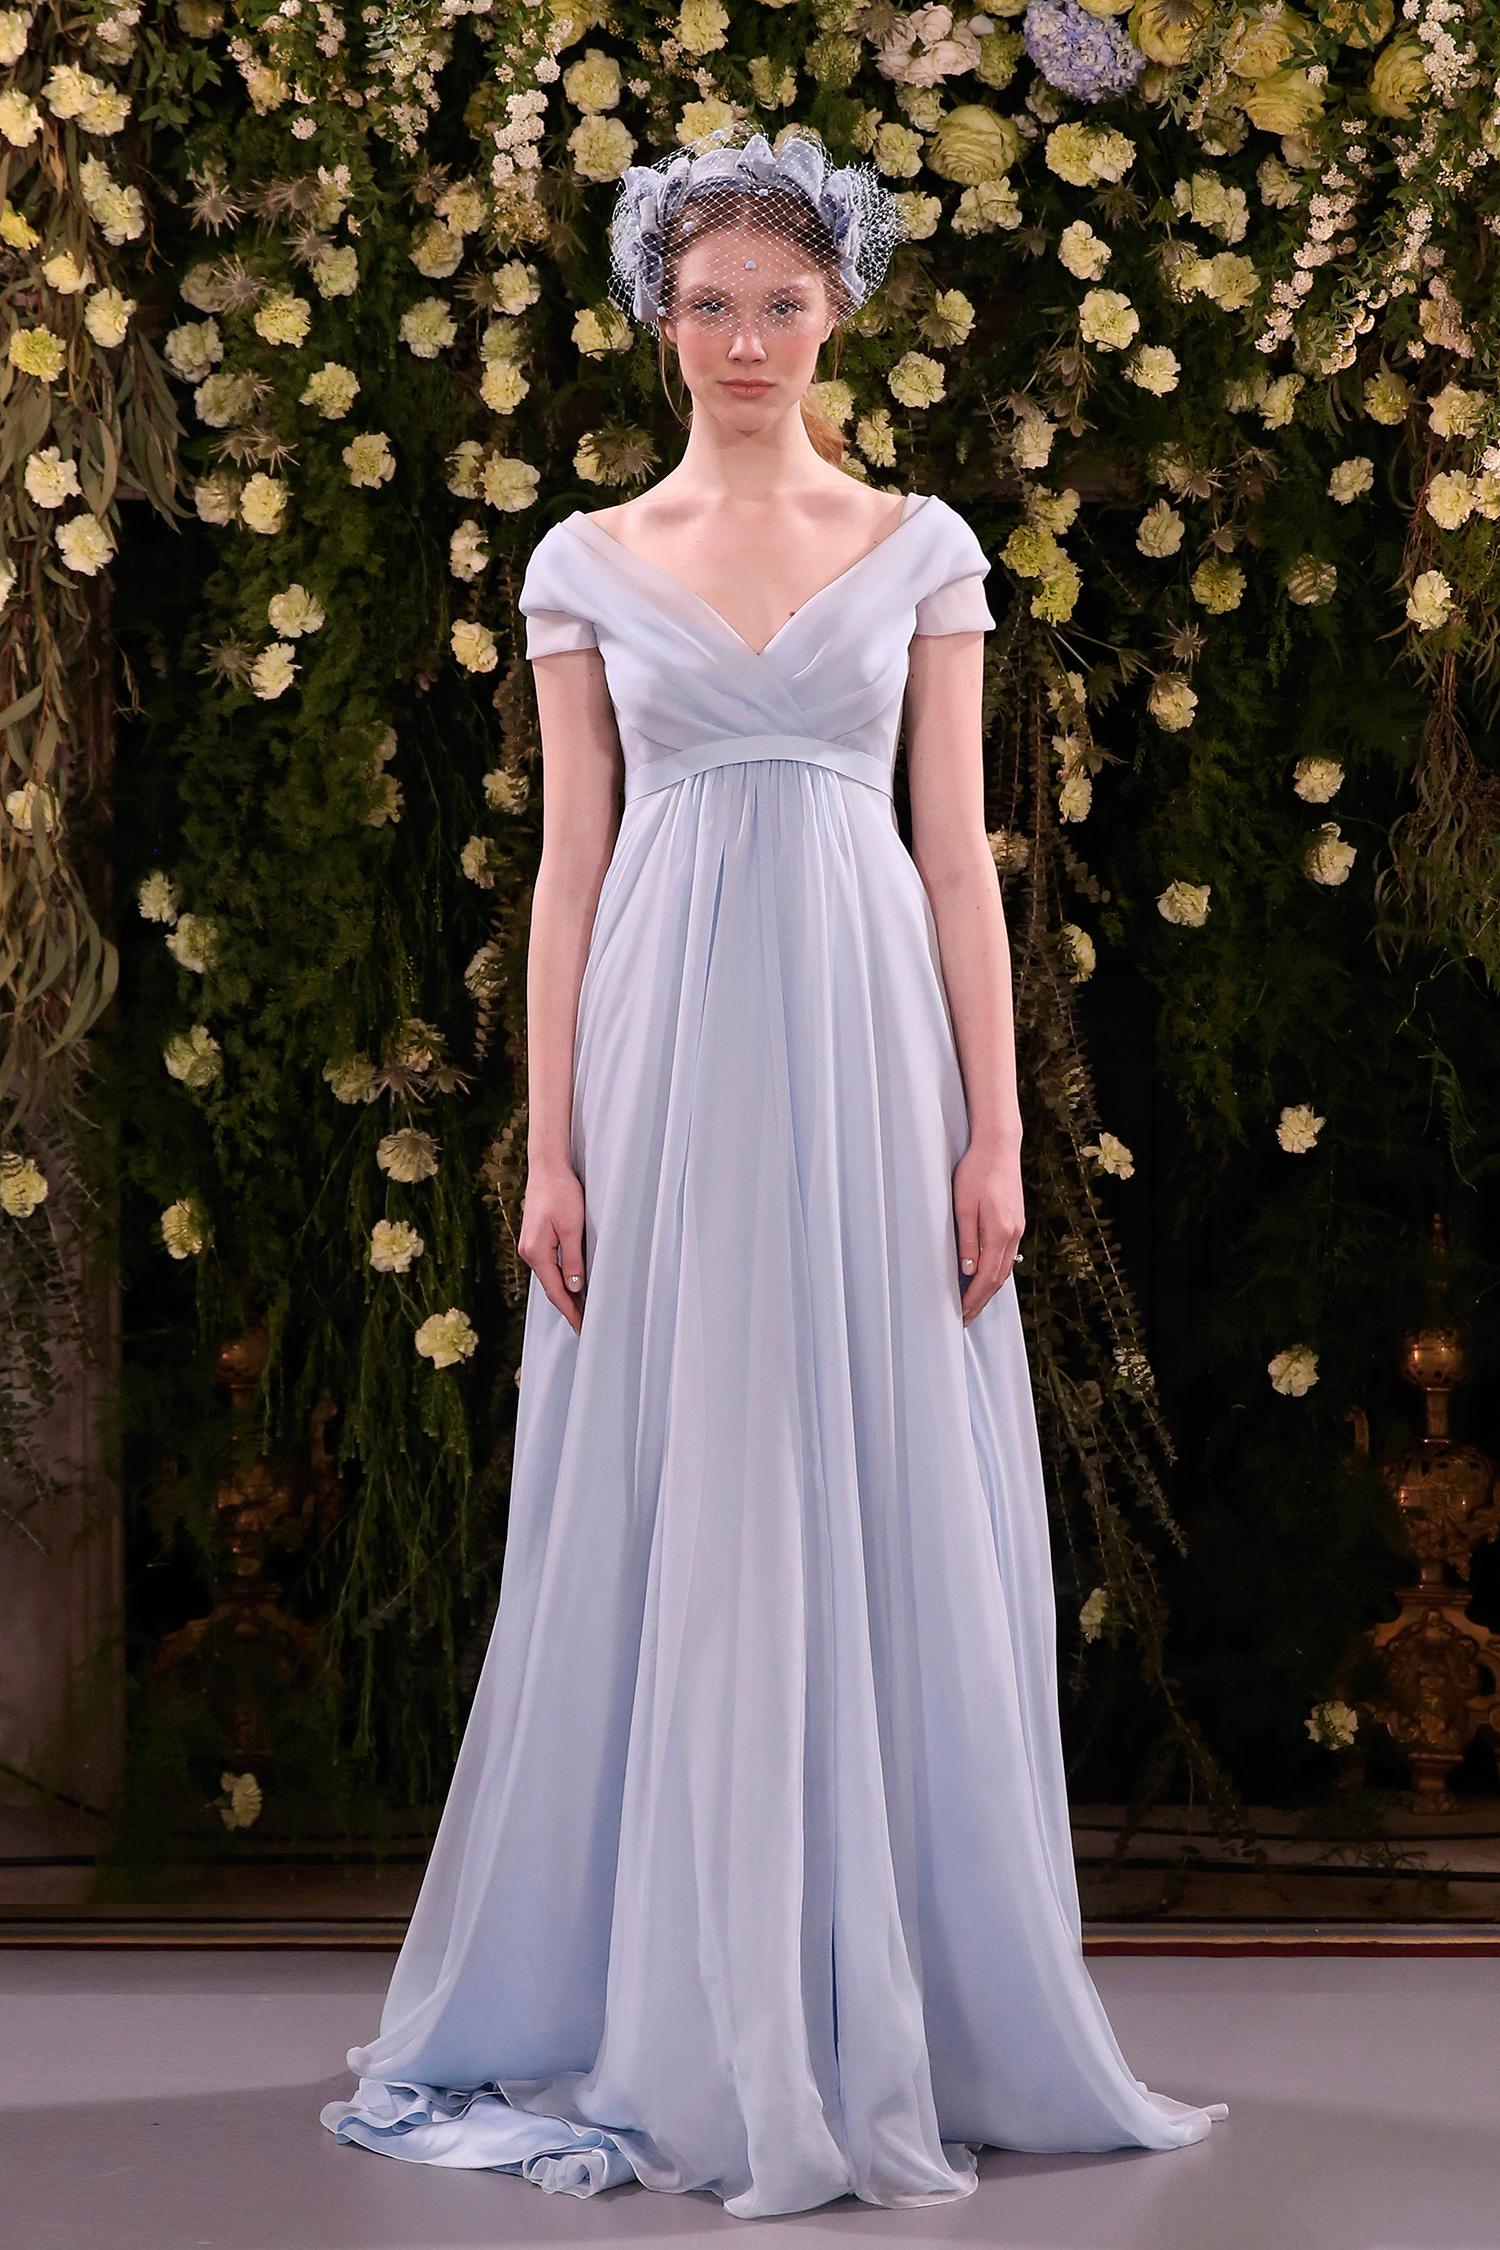 jenny packham wedding dress spring 2019 blue cap-sleeve a-line